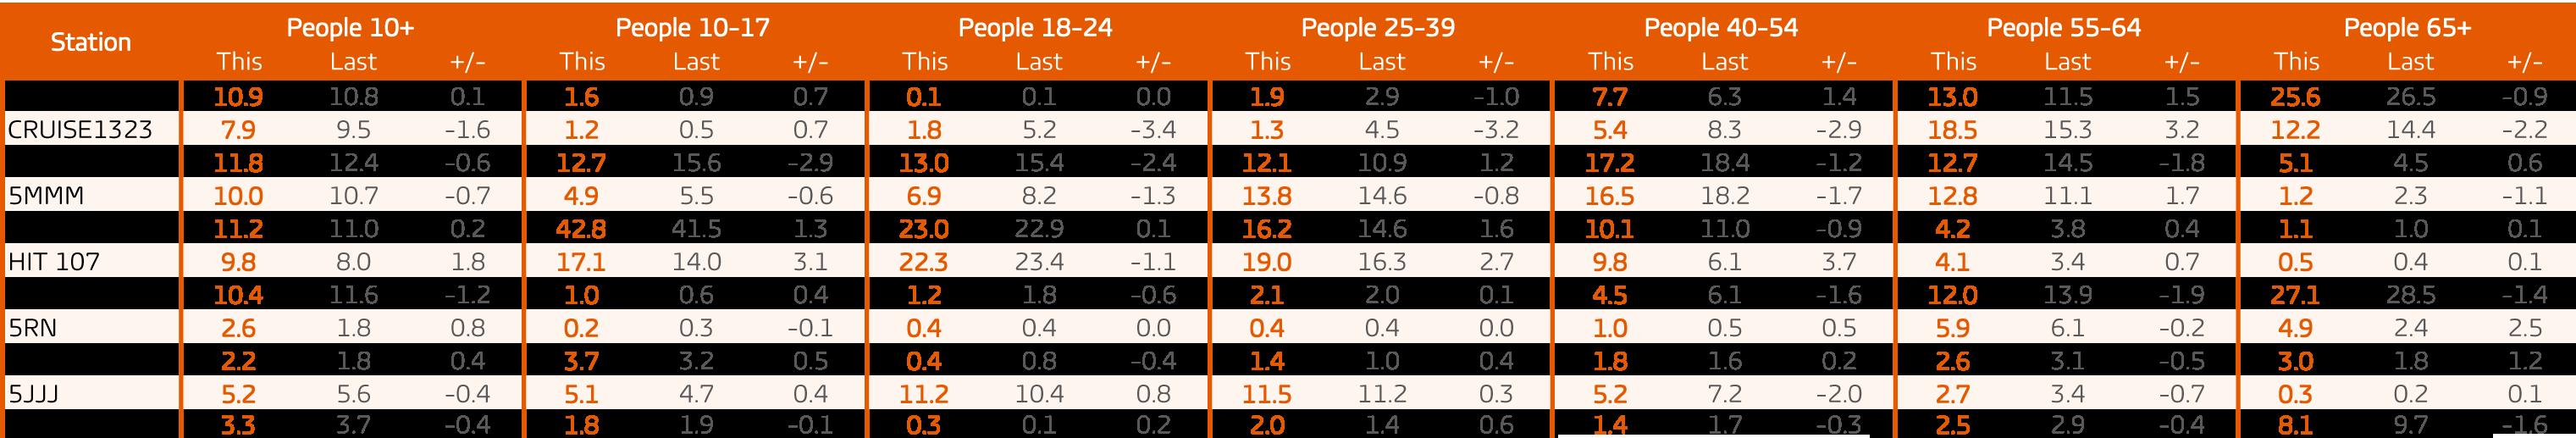 GfK_Share Report Adelaide_Survey 7 2017